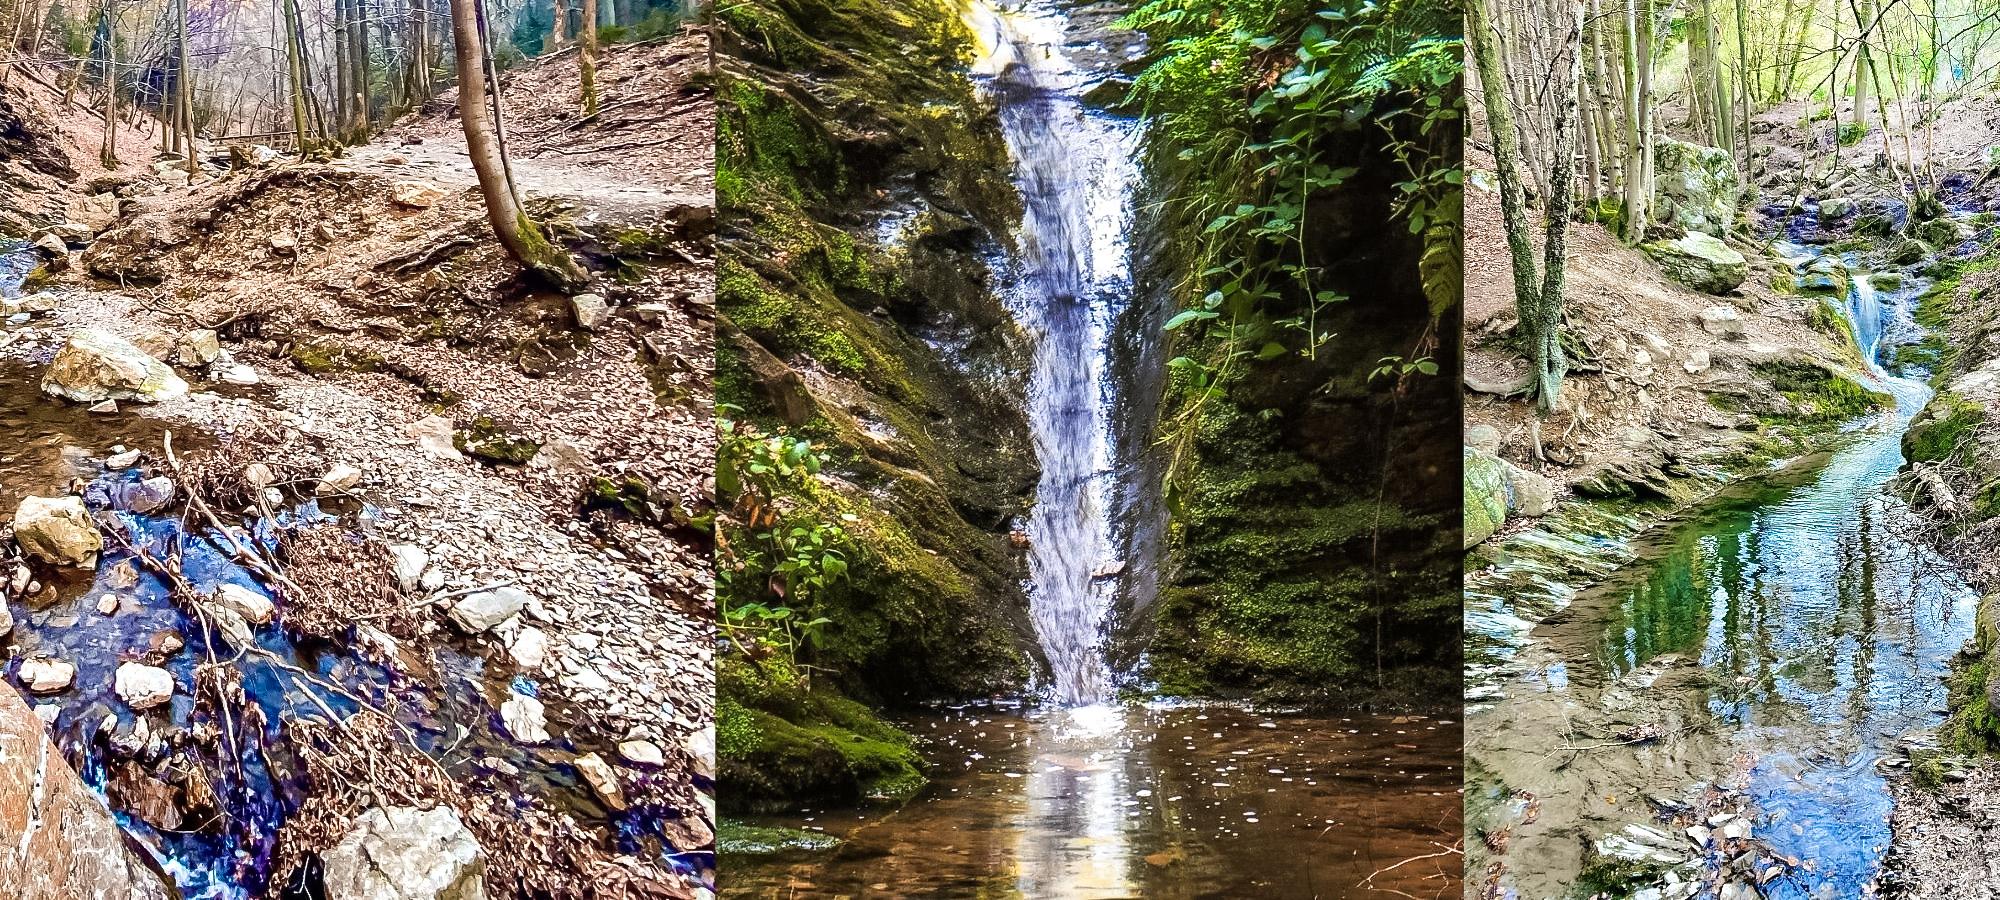 Rivers and waterfall on the Ninglinspo hike, Belgium